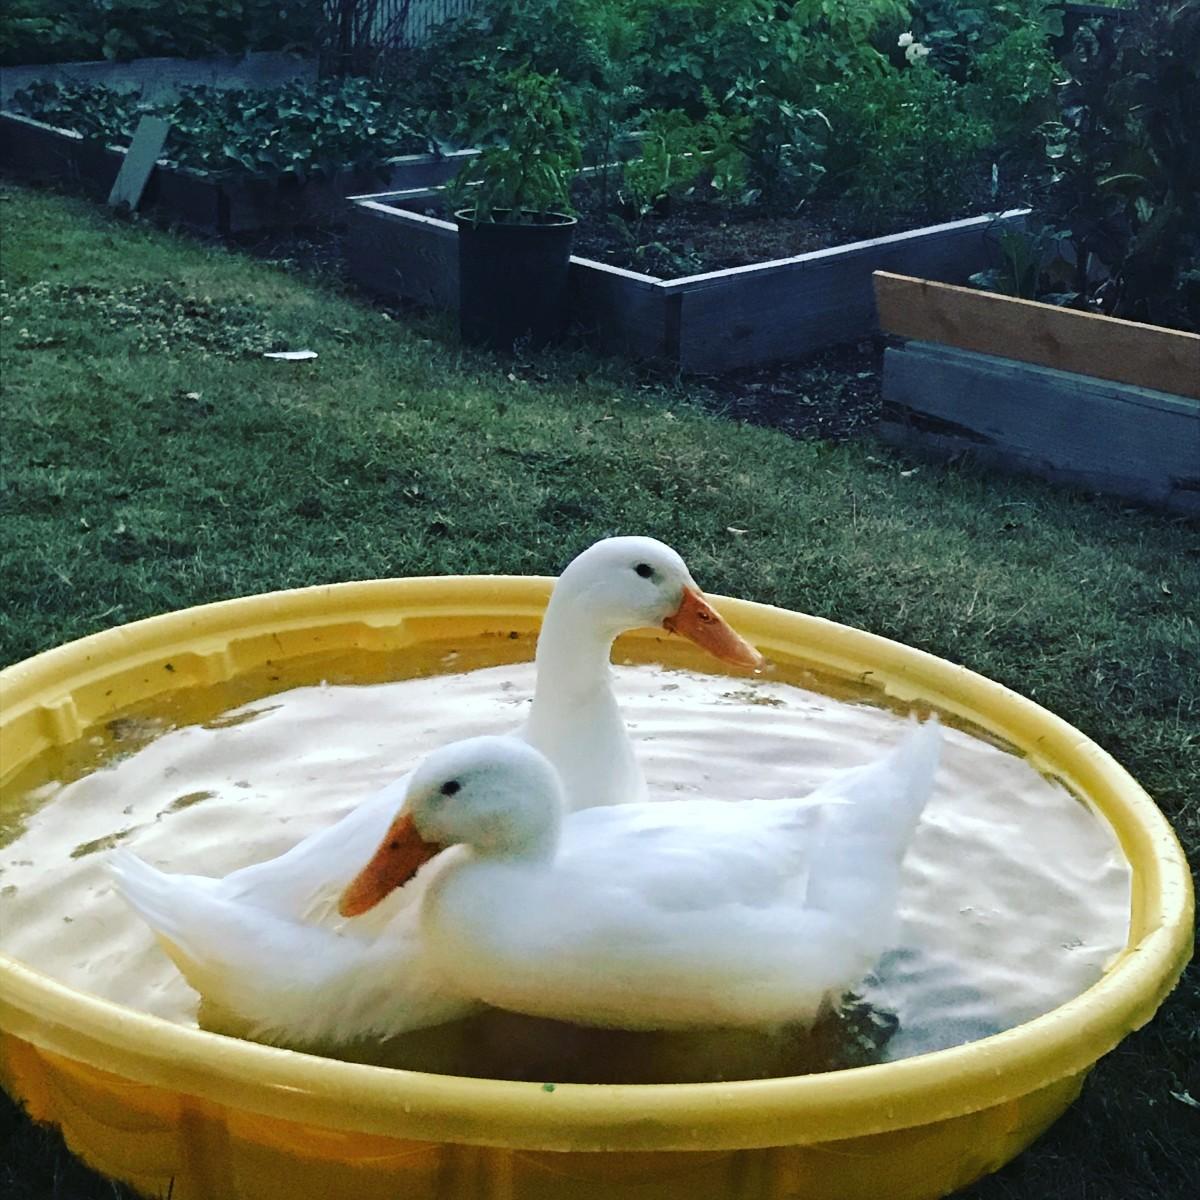 Pekin ducks going for a swim